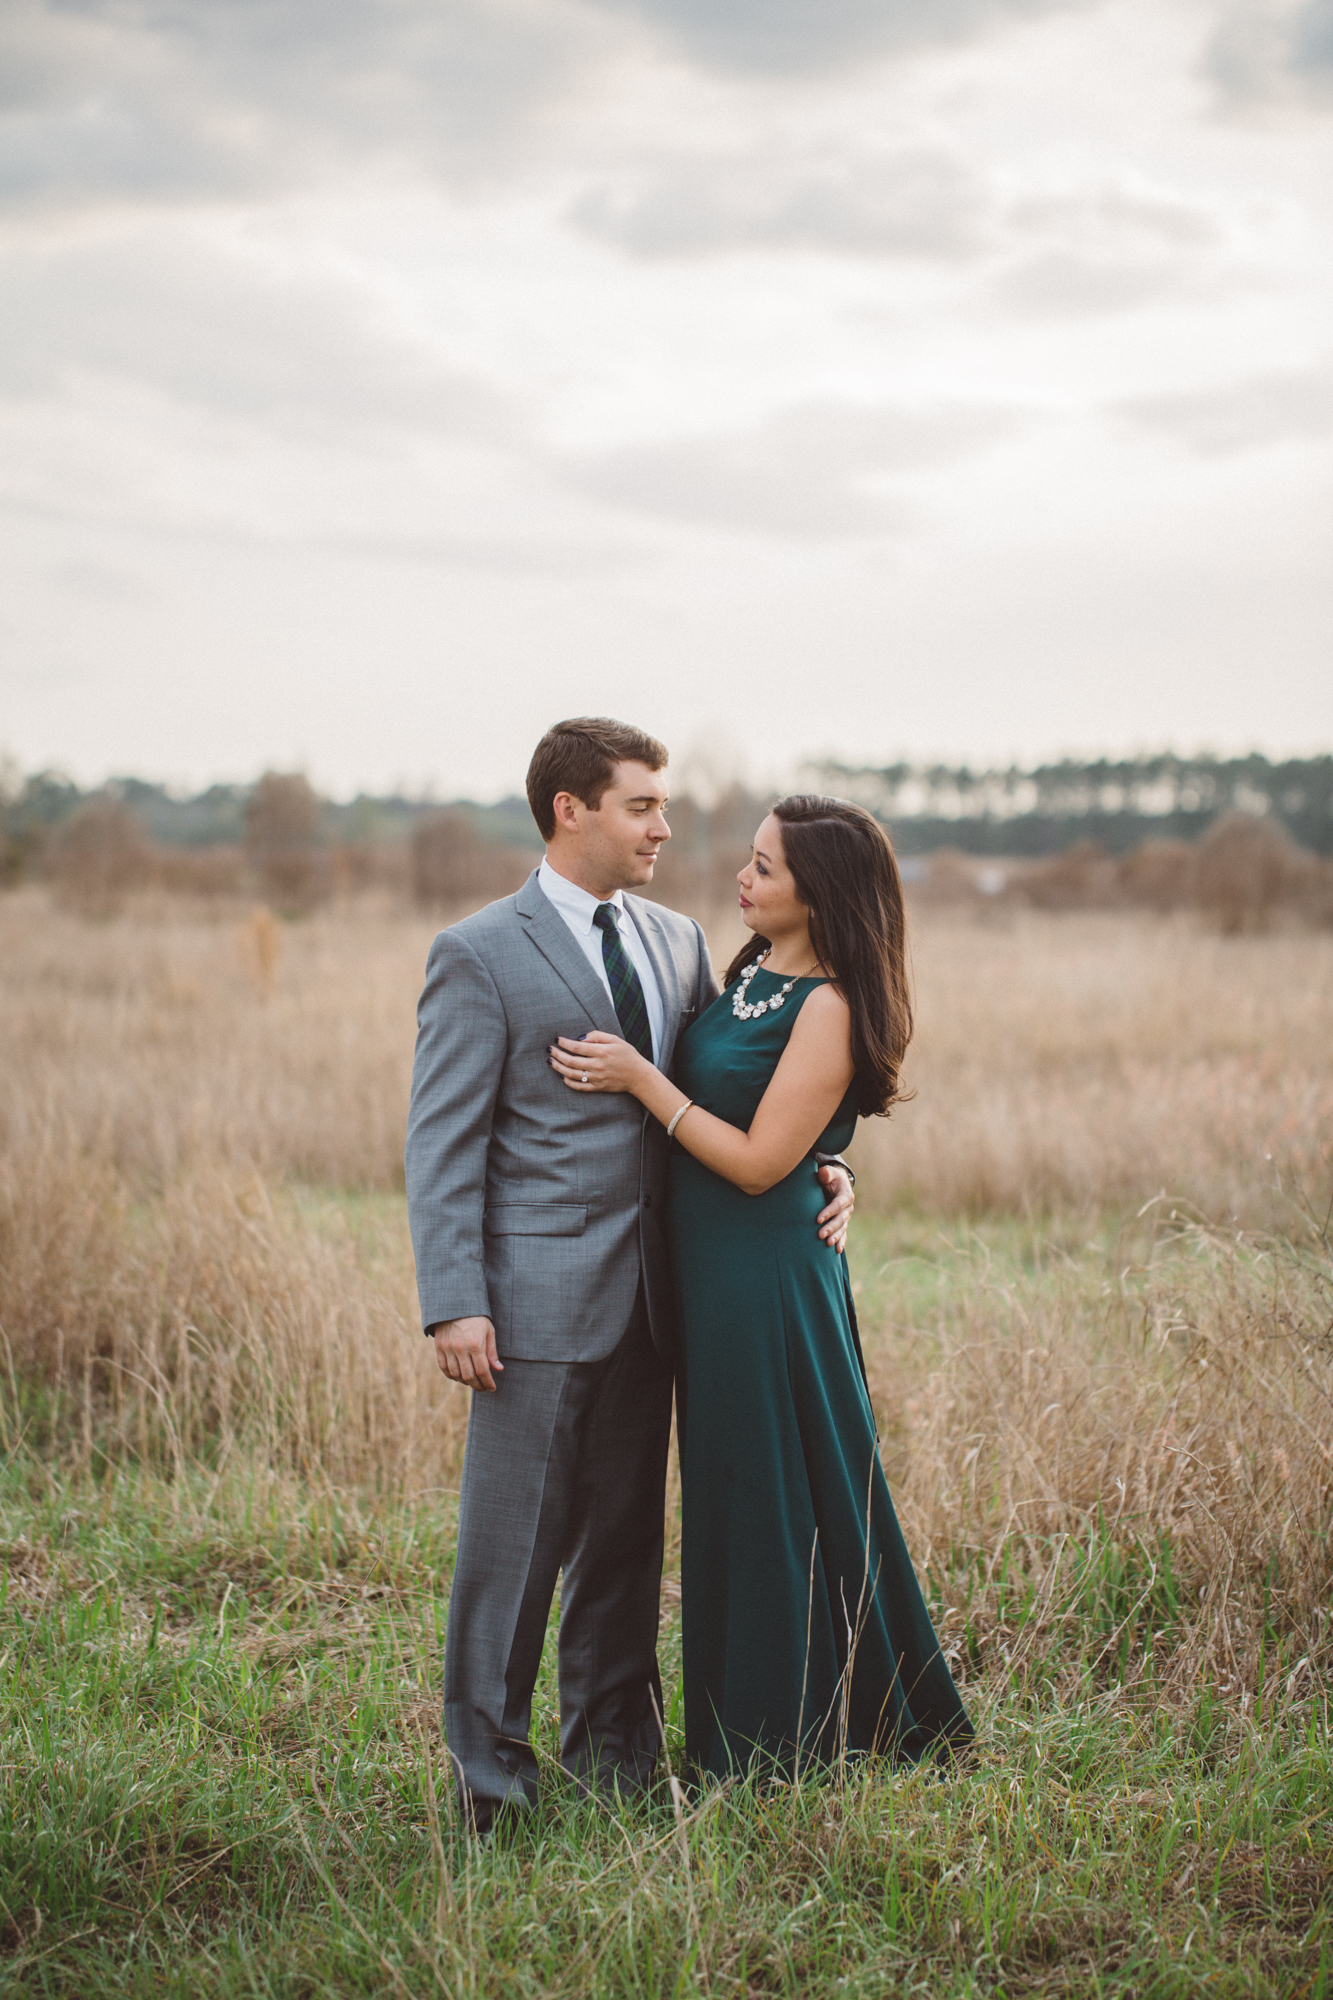 Orlando Engagement Photographer-33.jpg